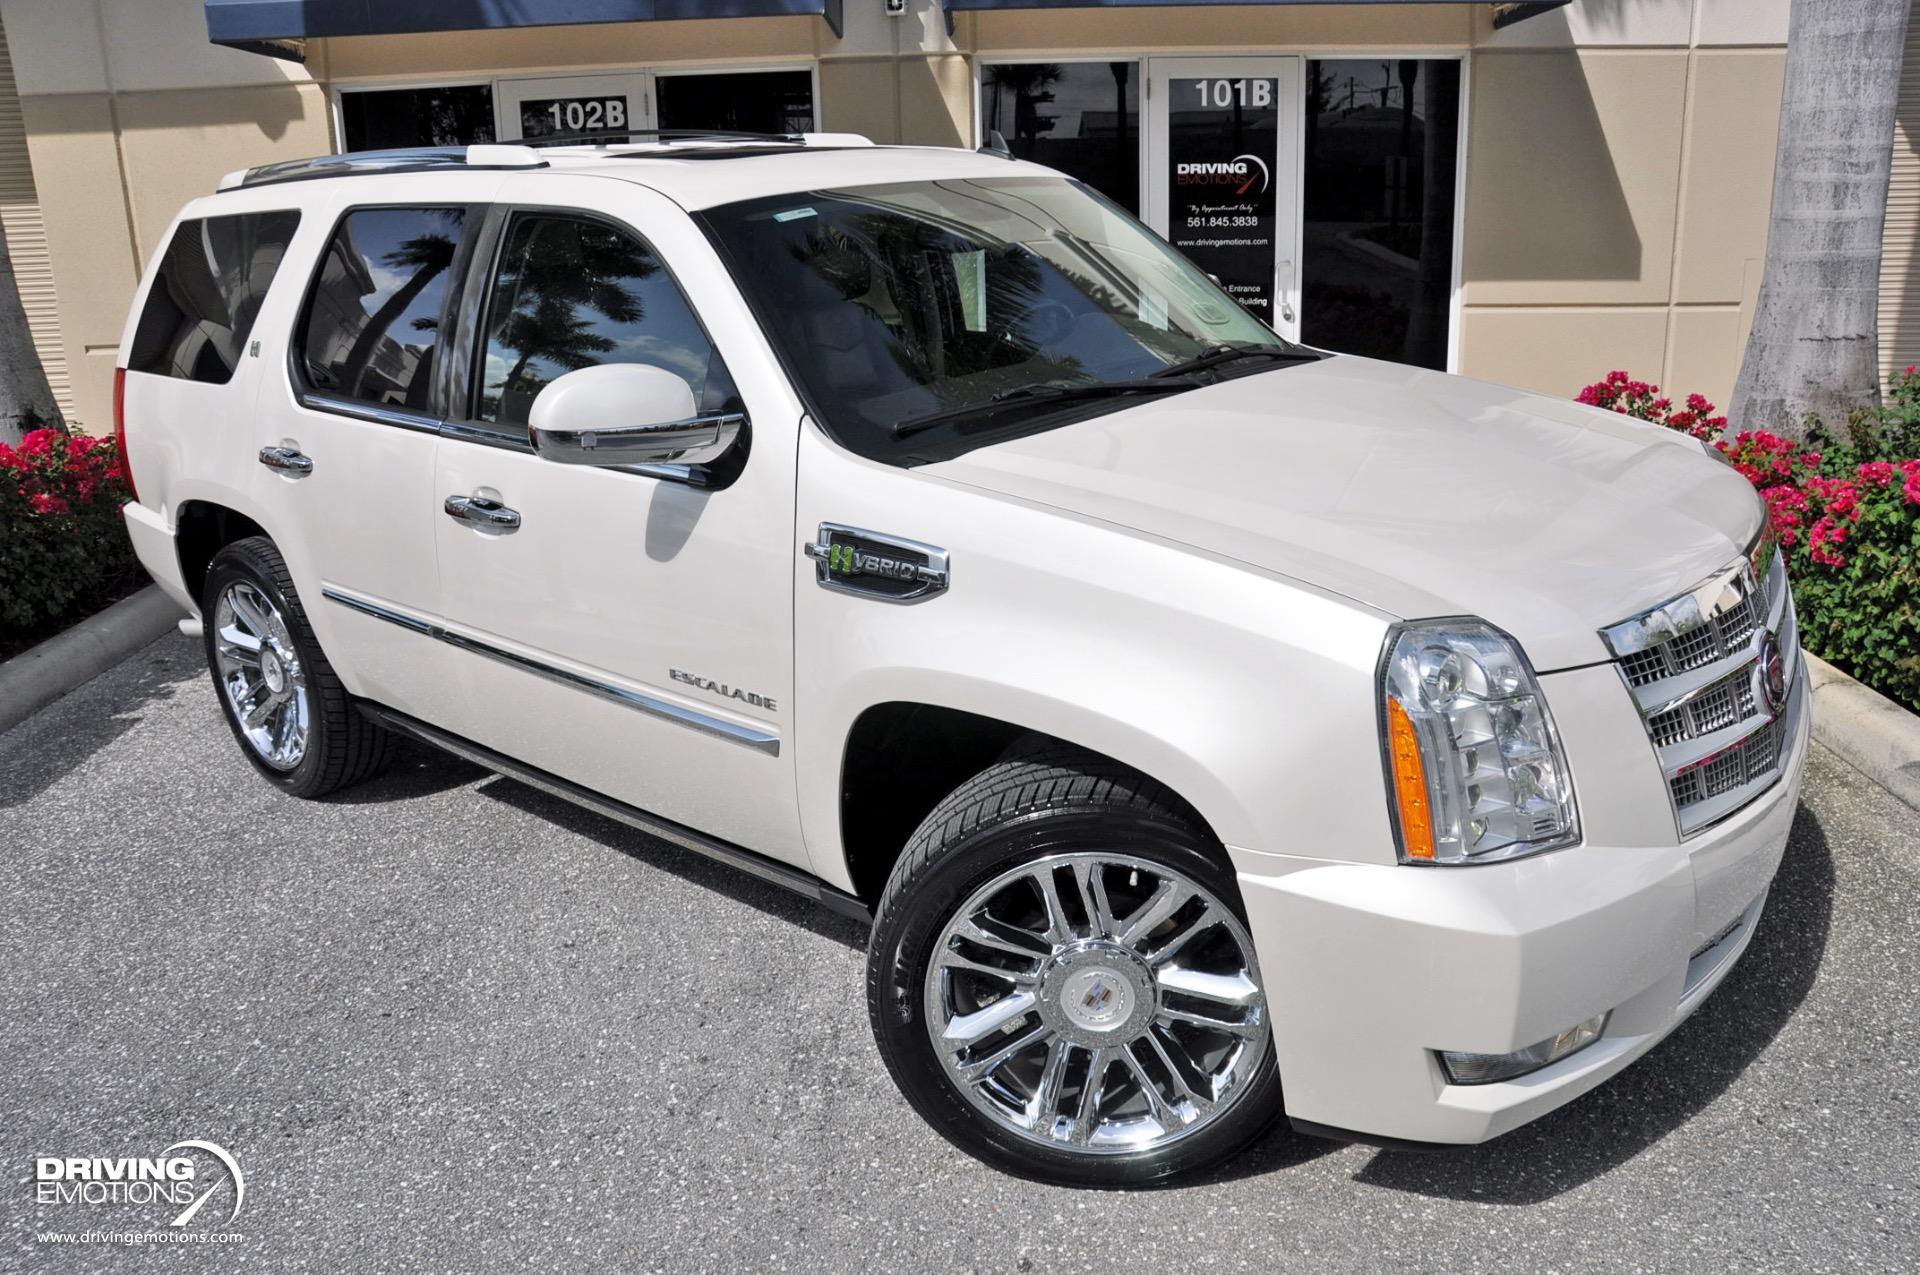 Used 2010 Cadillac Escalade Hybrid Platinum Edition | Lake Park, FL